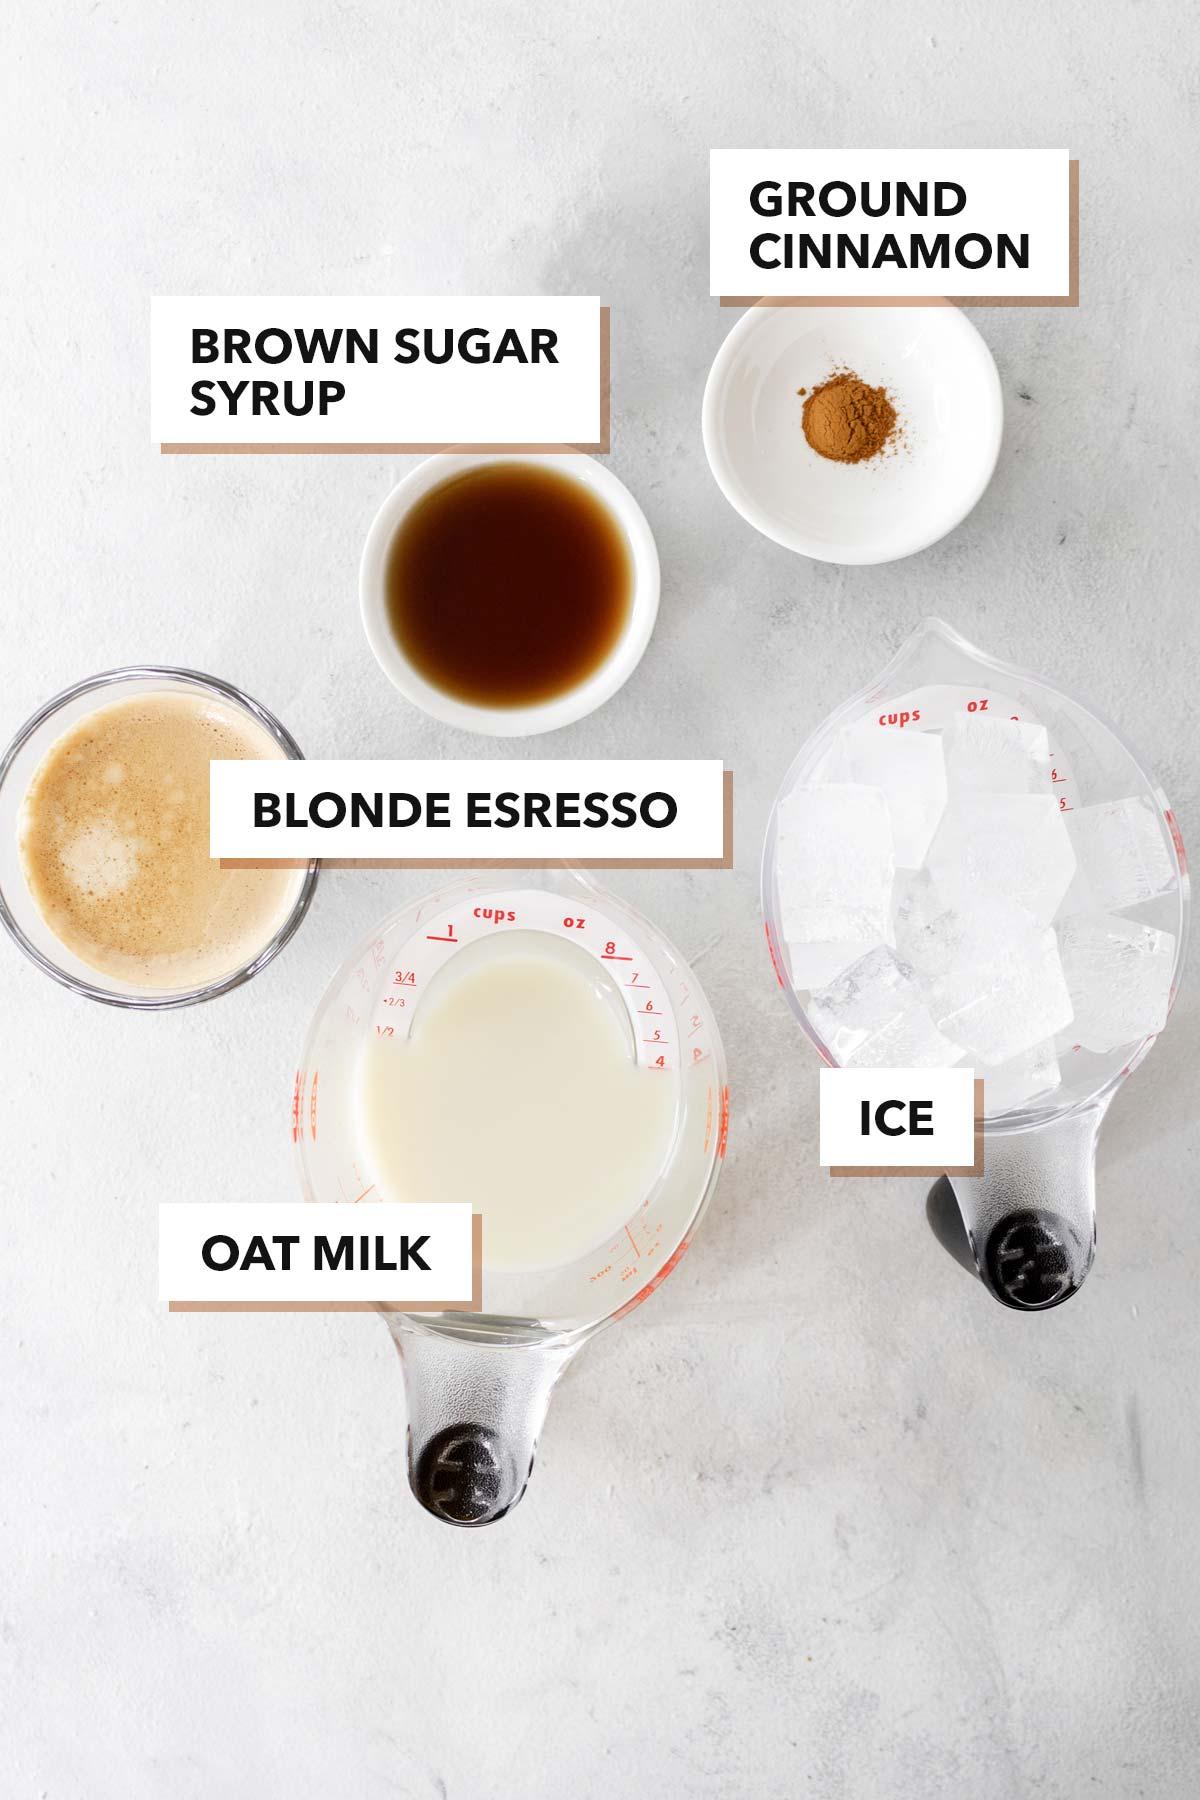 Starbucks Iced Brown Sugar Oatmilk Shaken Espresso copycat drink recipe ingredients.